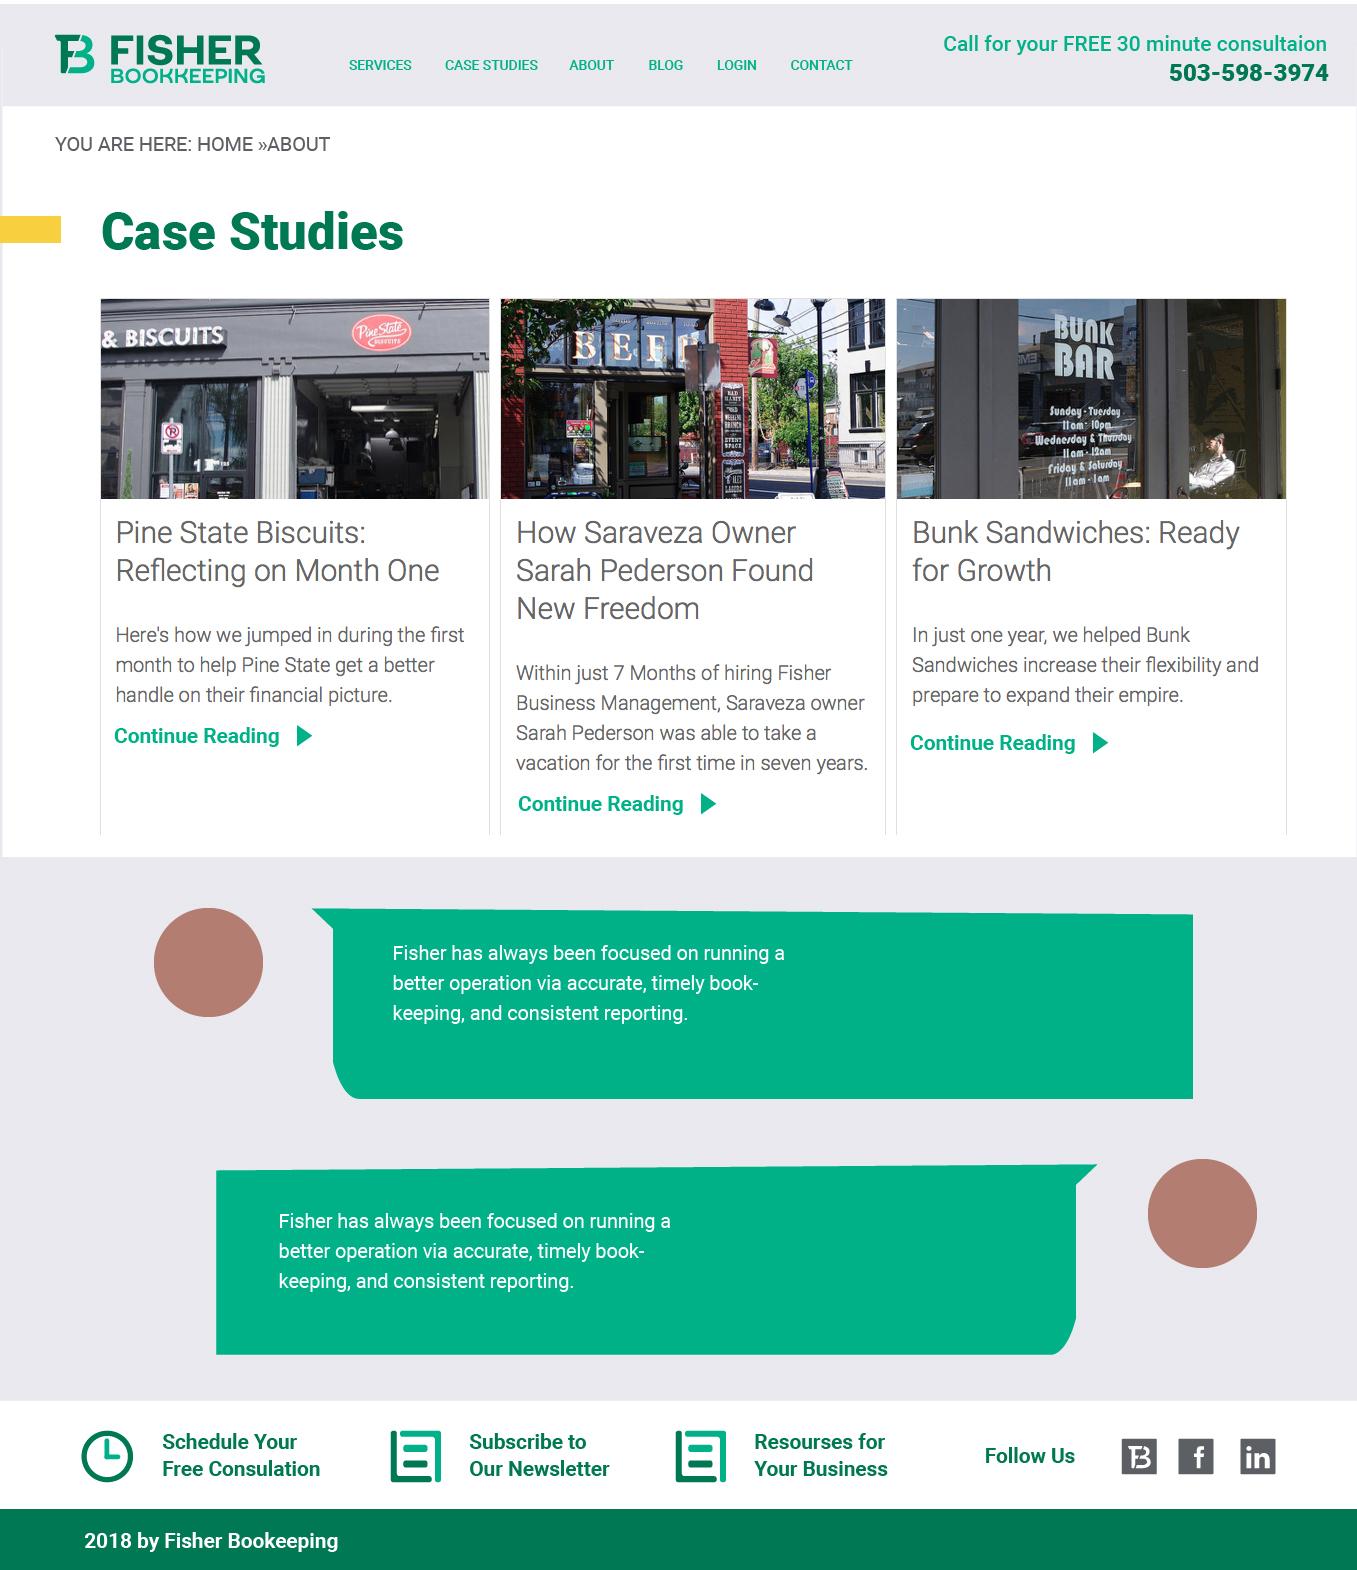 Case Studies 5@72x-100.jpg